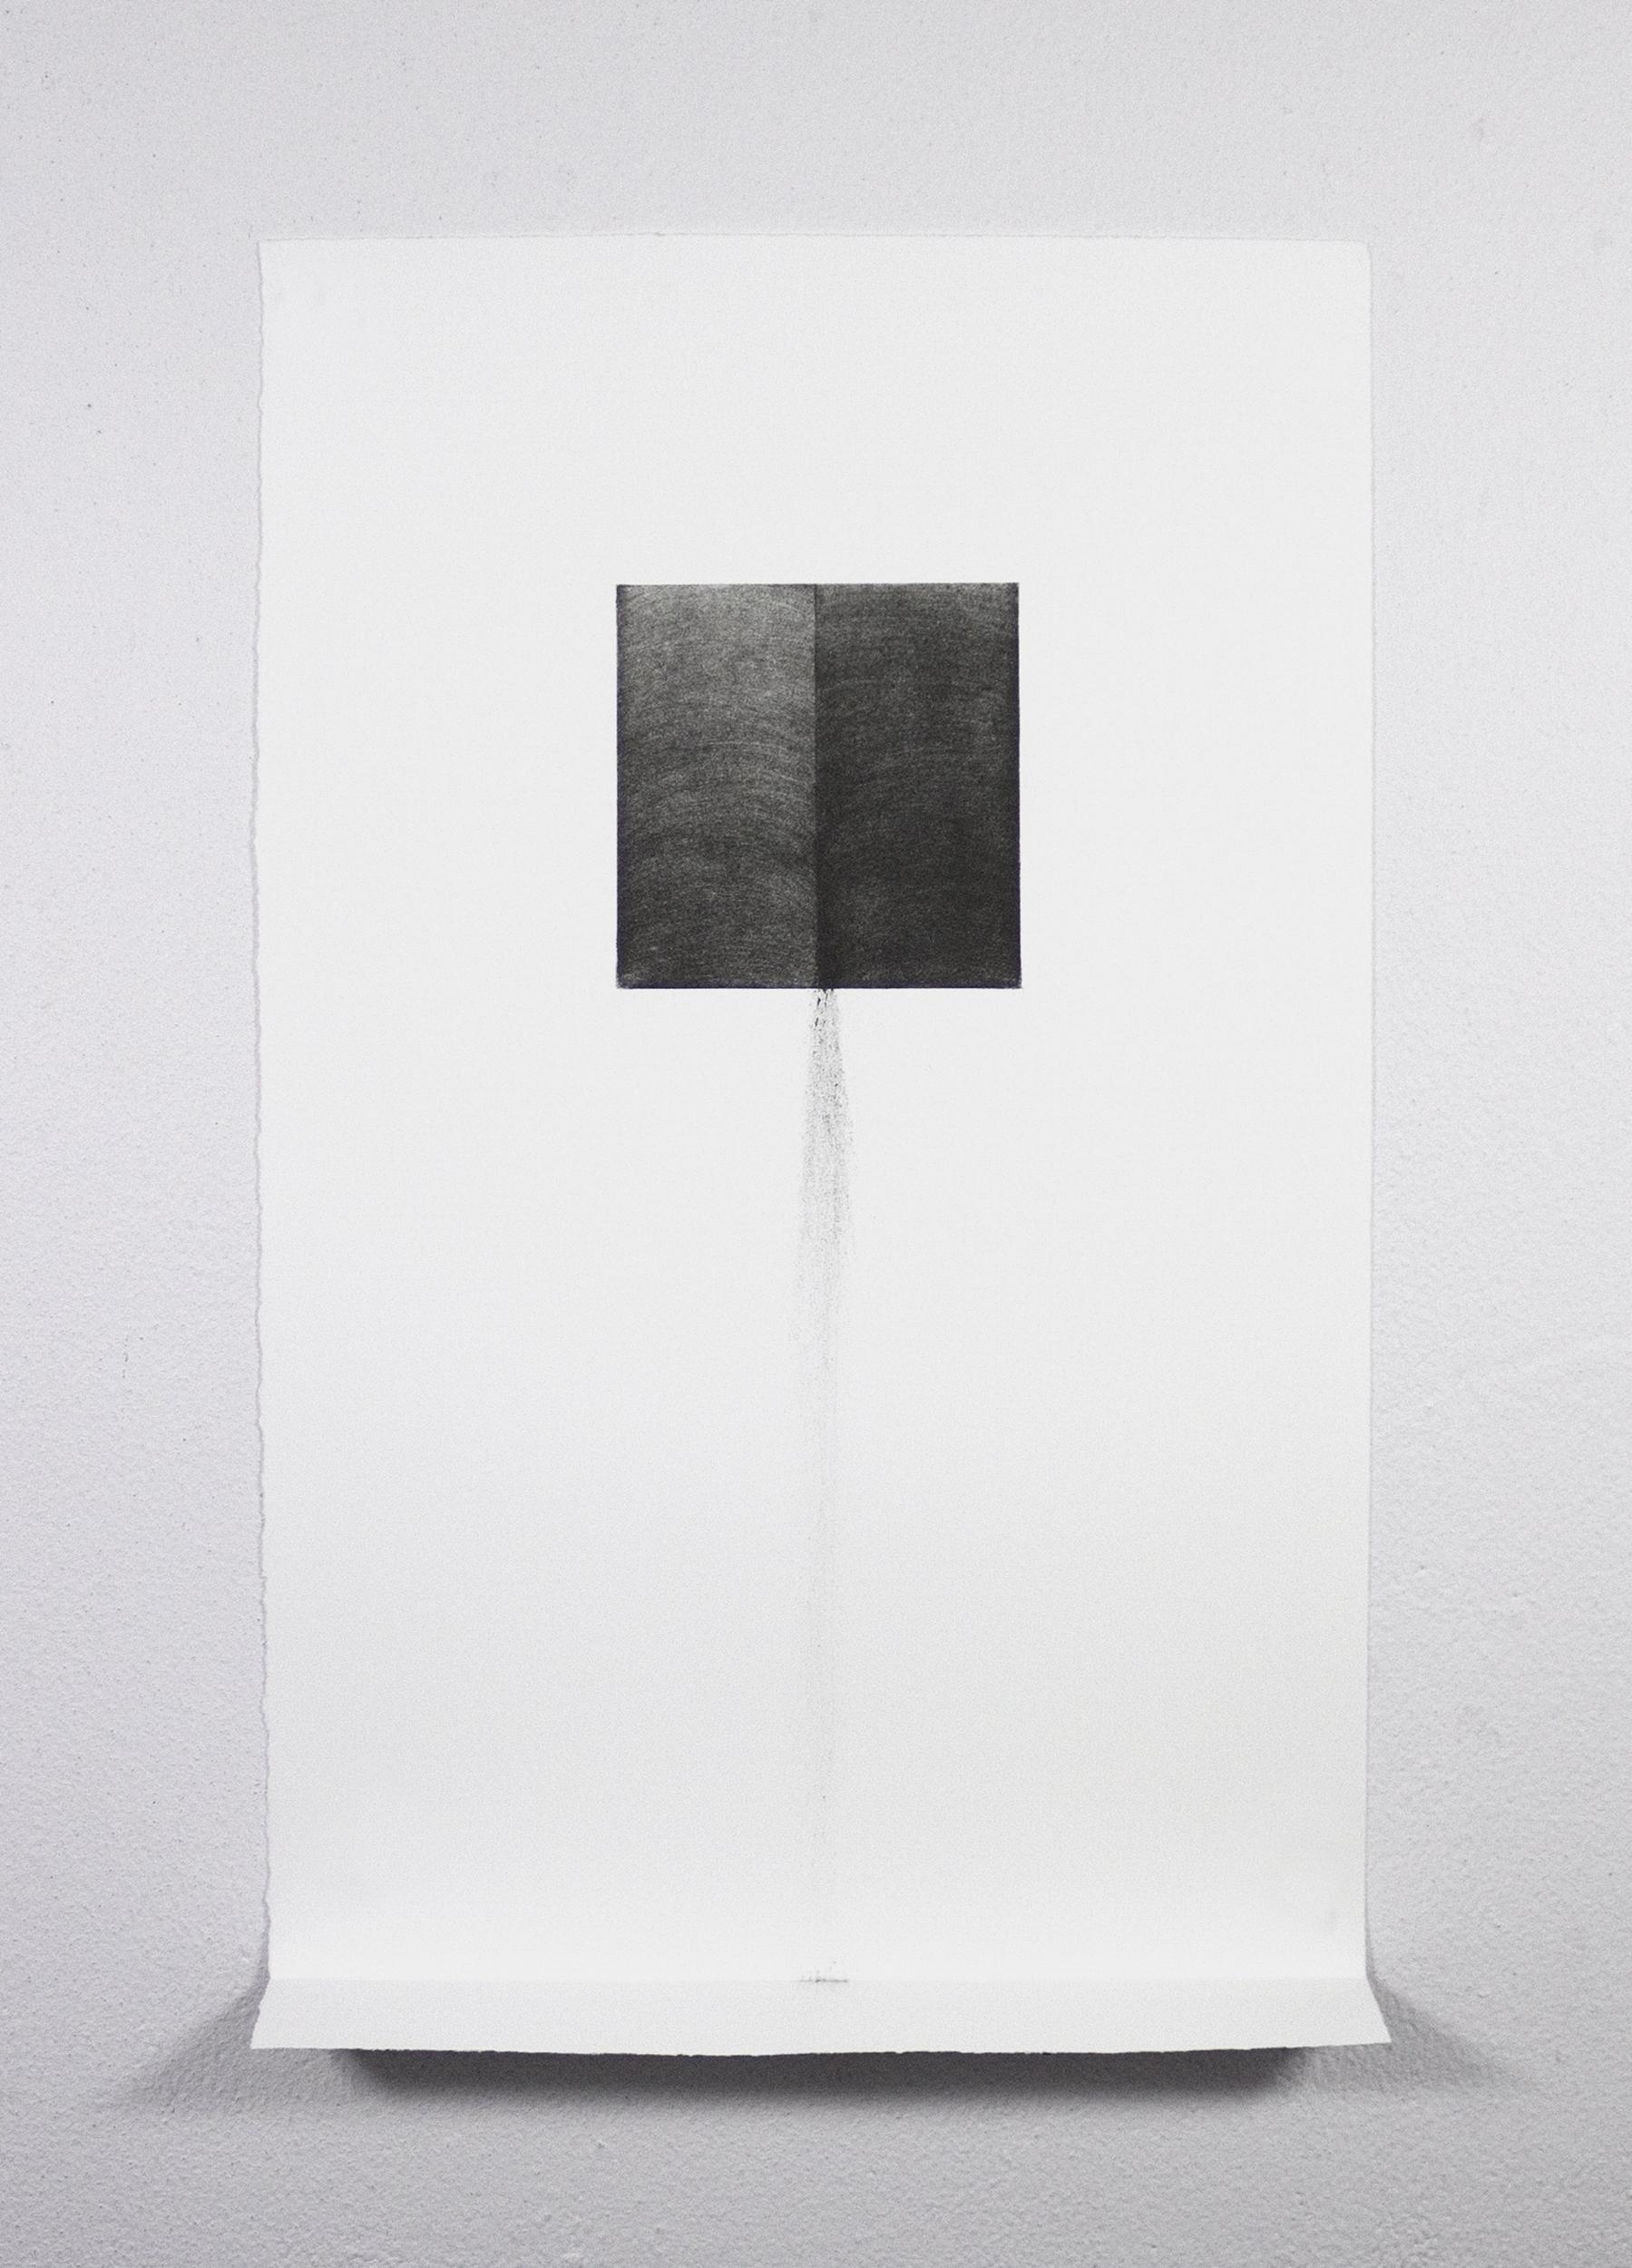 "Unfolding Gravity No.1, 2015  Single-color lithograph, Edition of 15, 17.5x11x1.5"" (Paper size), Framed size: 18.8"" x 13"" x 2.5"",  Contributing Printer: Bill Lagattuta at Tamarind Institute"